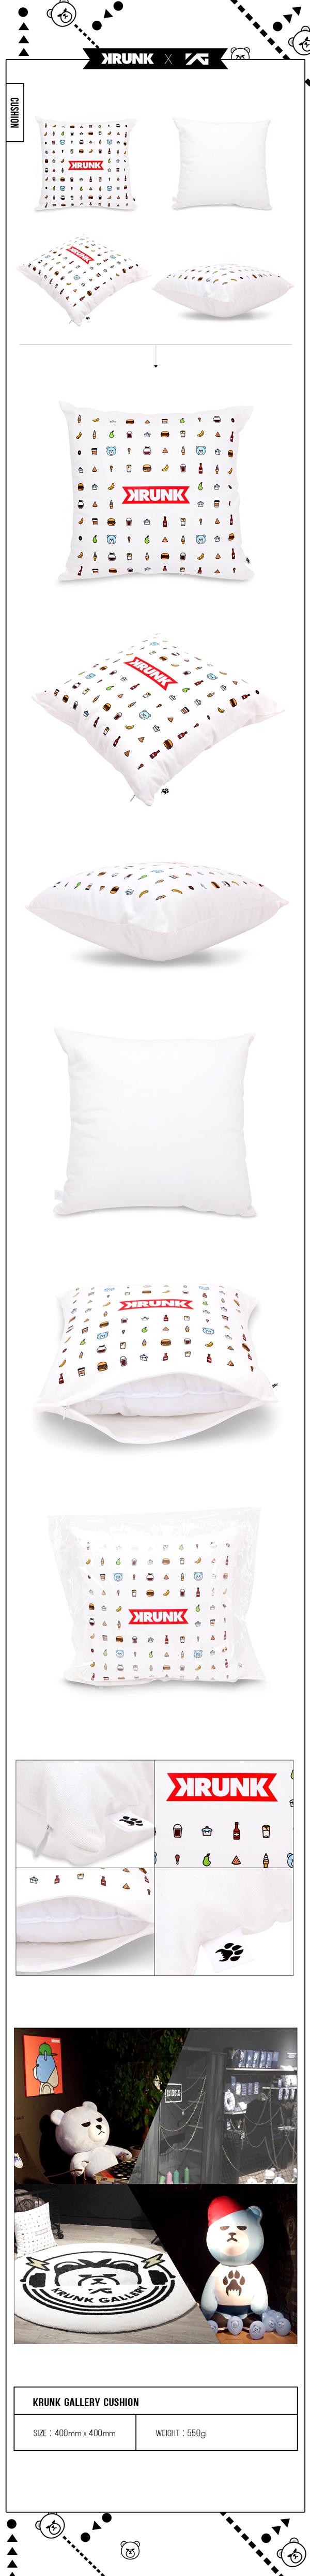 cushion_01